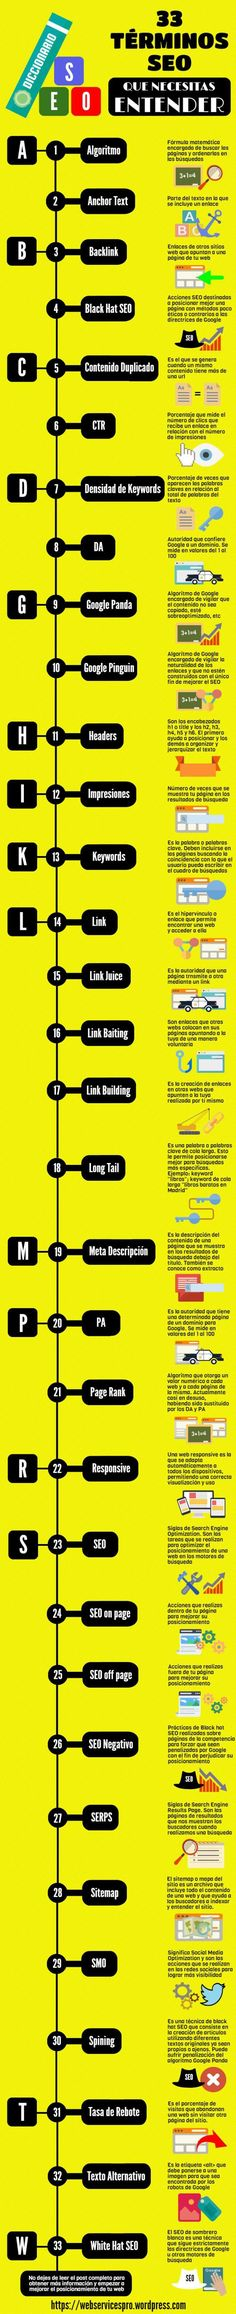 33 términos que debes conocer sobre el SEO #infografia